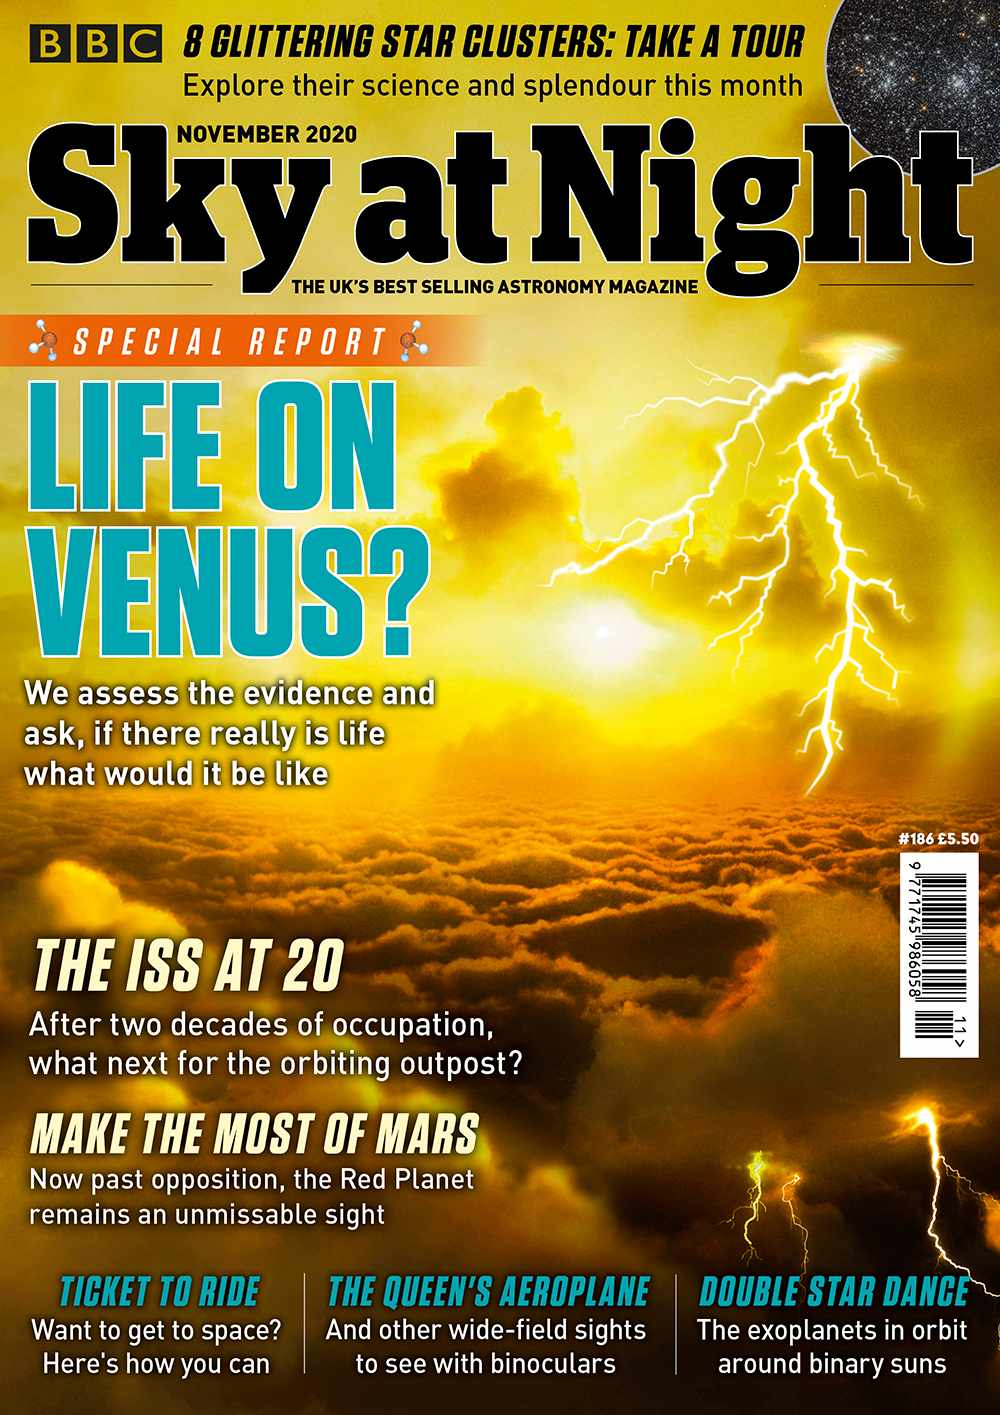 BBC Sky at Night Magazine November 2020 issue